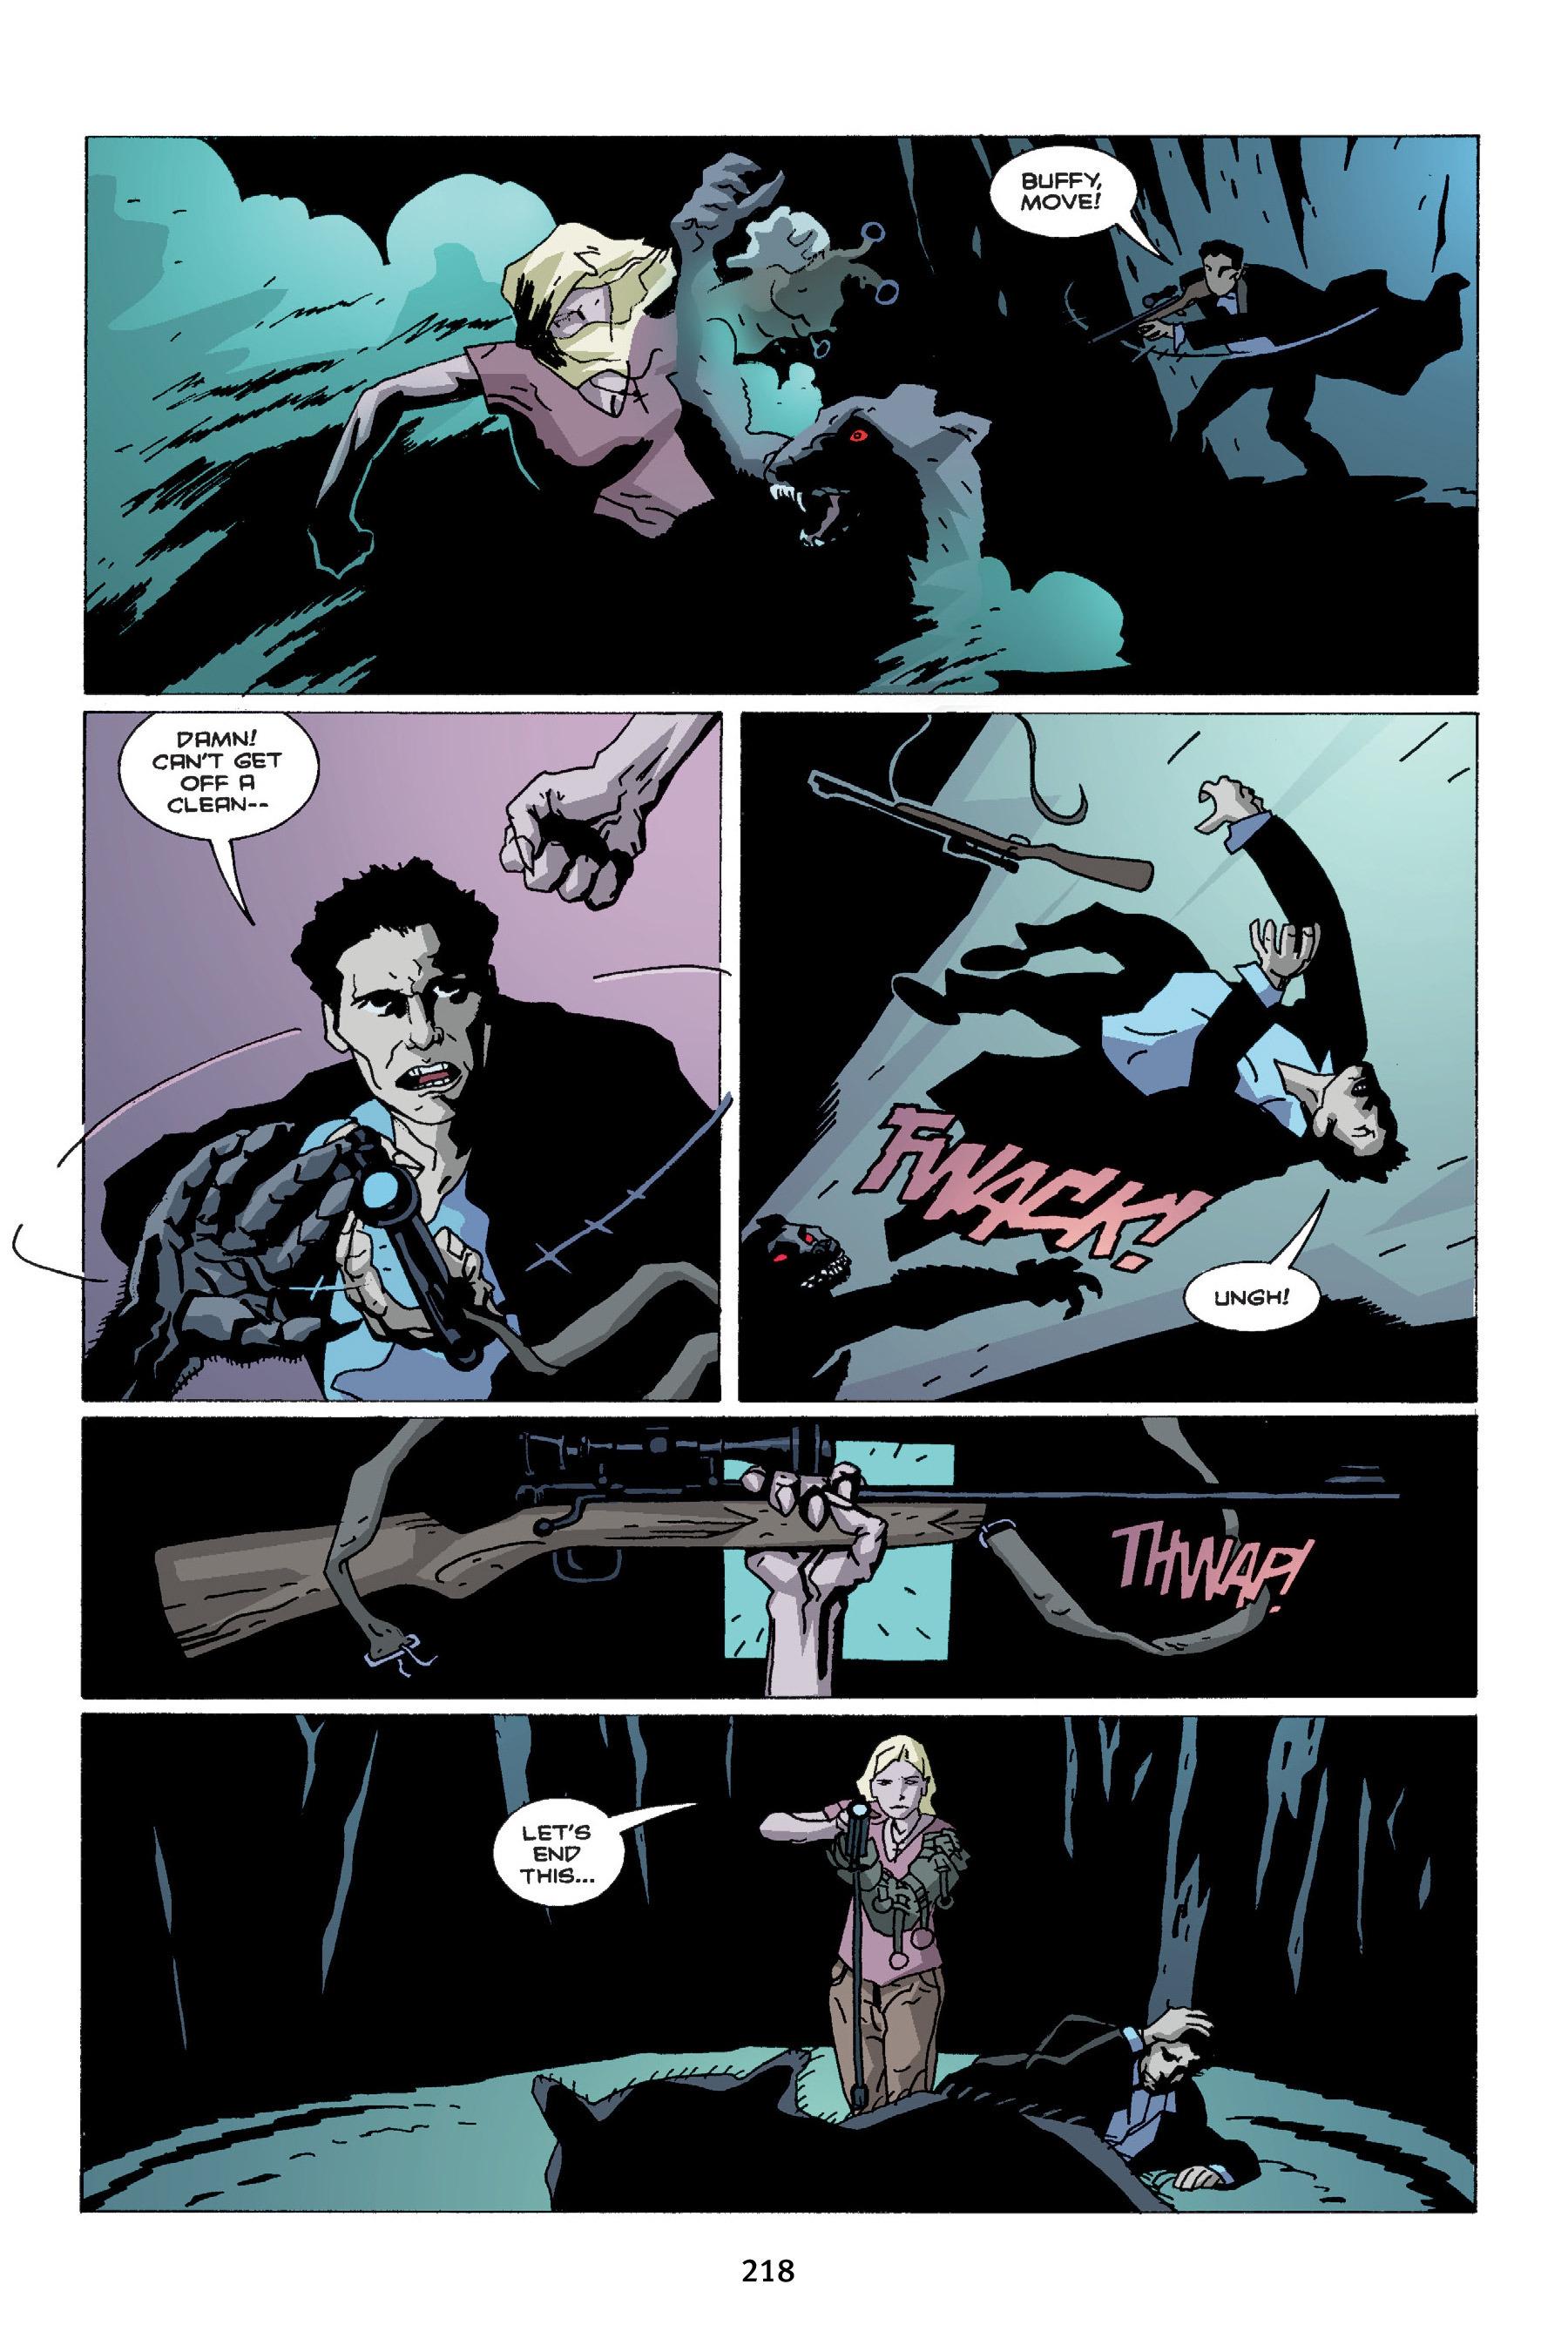 Read online Buffy the Vampire Slayer: Omnibus comic -  Issue # TPB 4 - 216